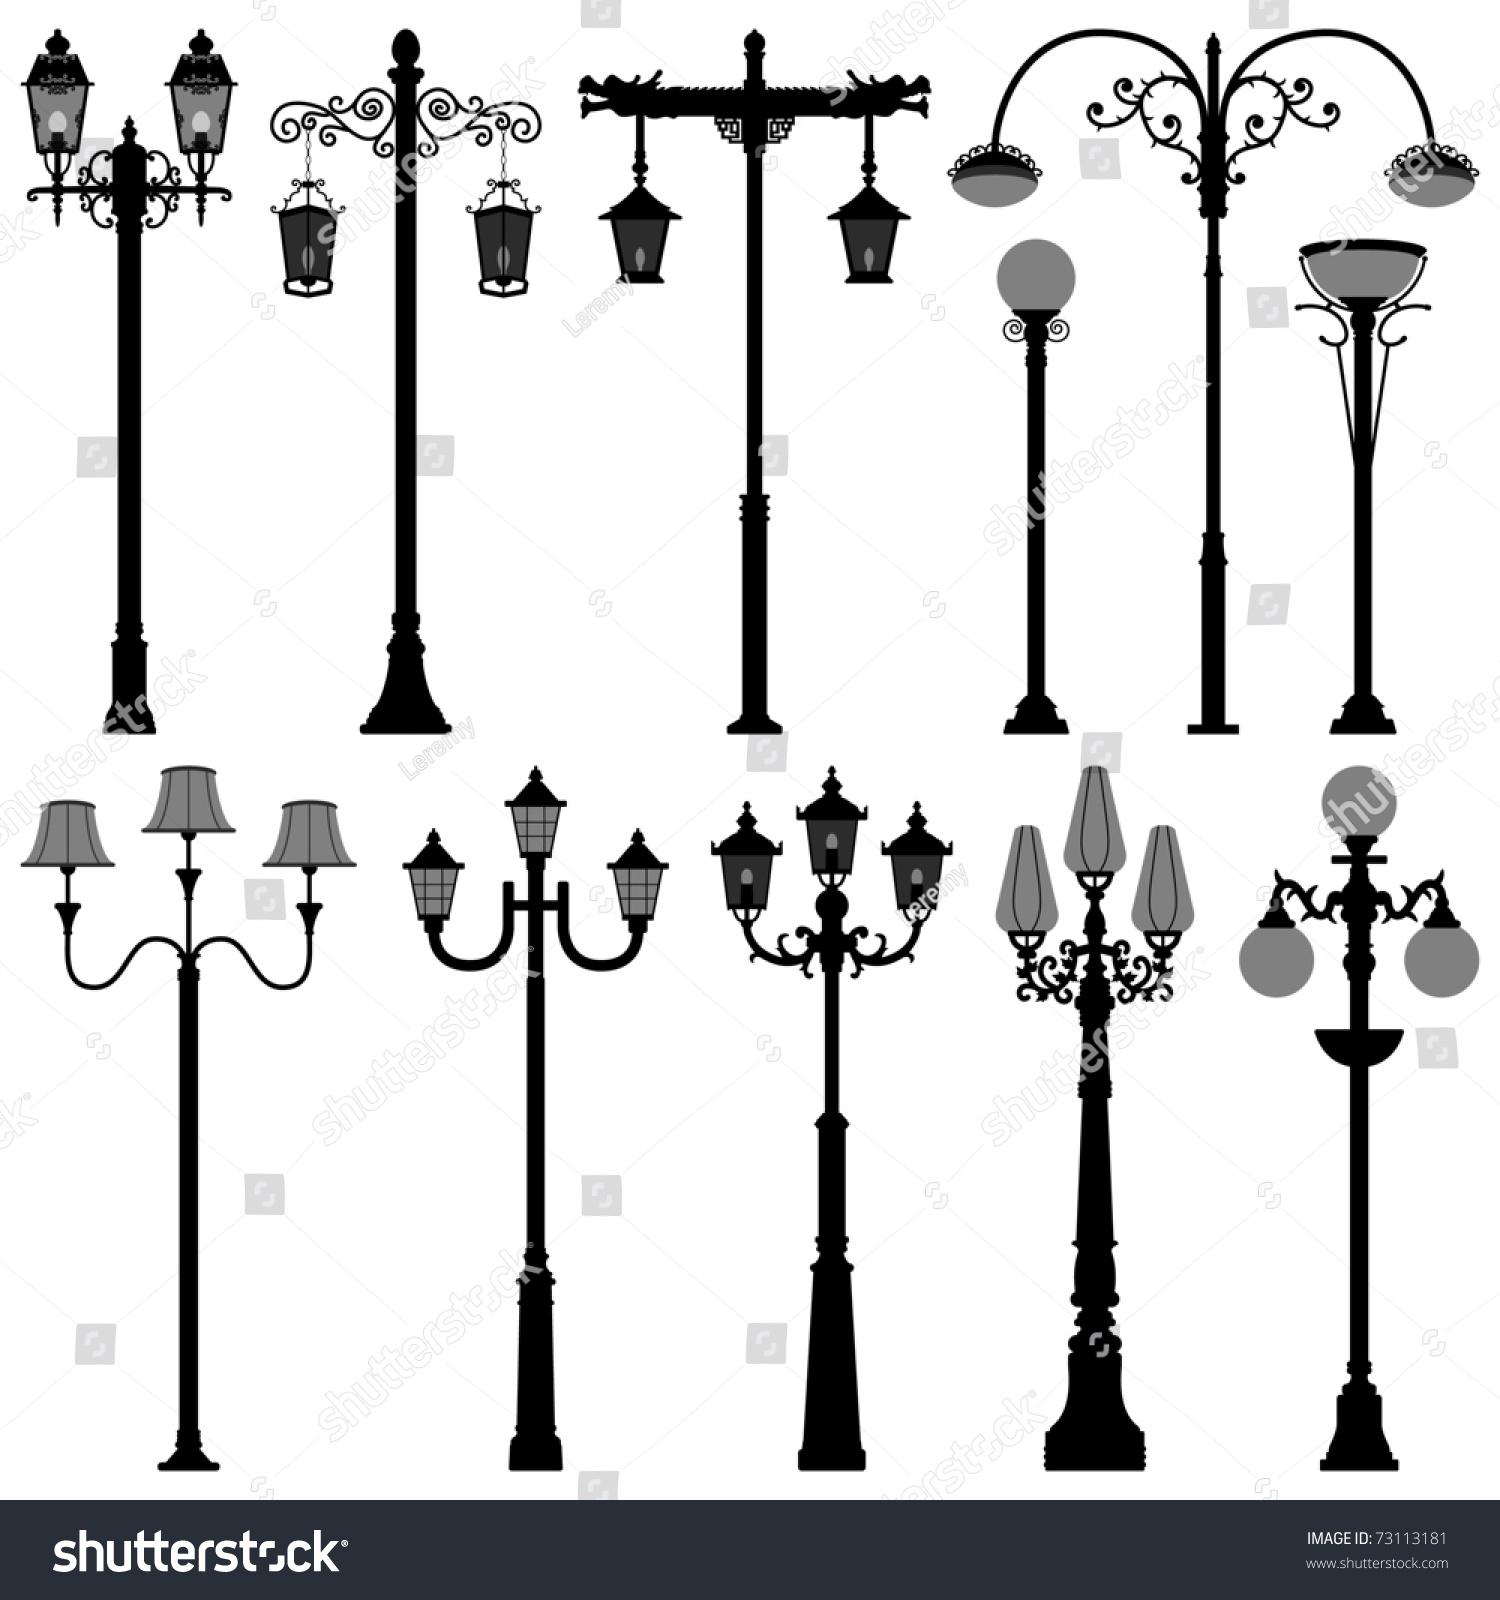 Light Pole Terminology: Lamp Post Lamppost Street Road Light Stock Vector 73113181